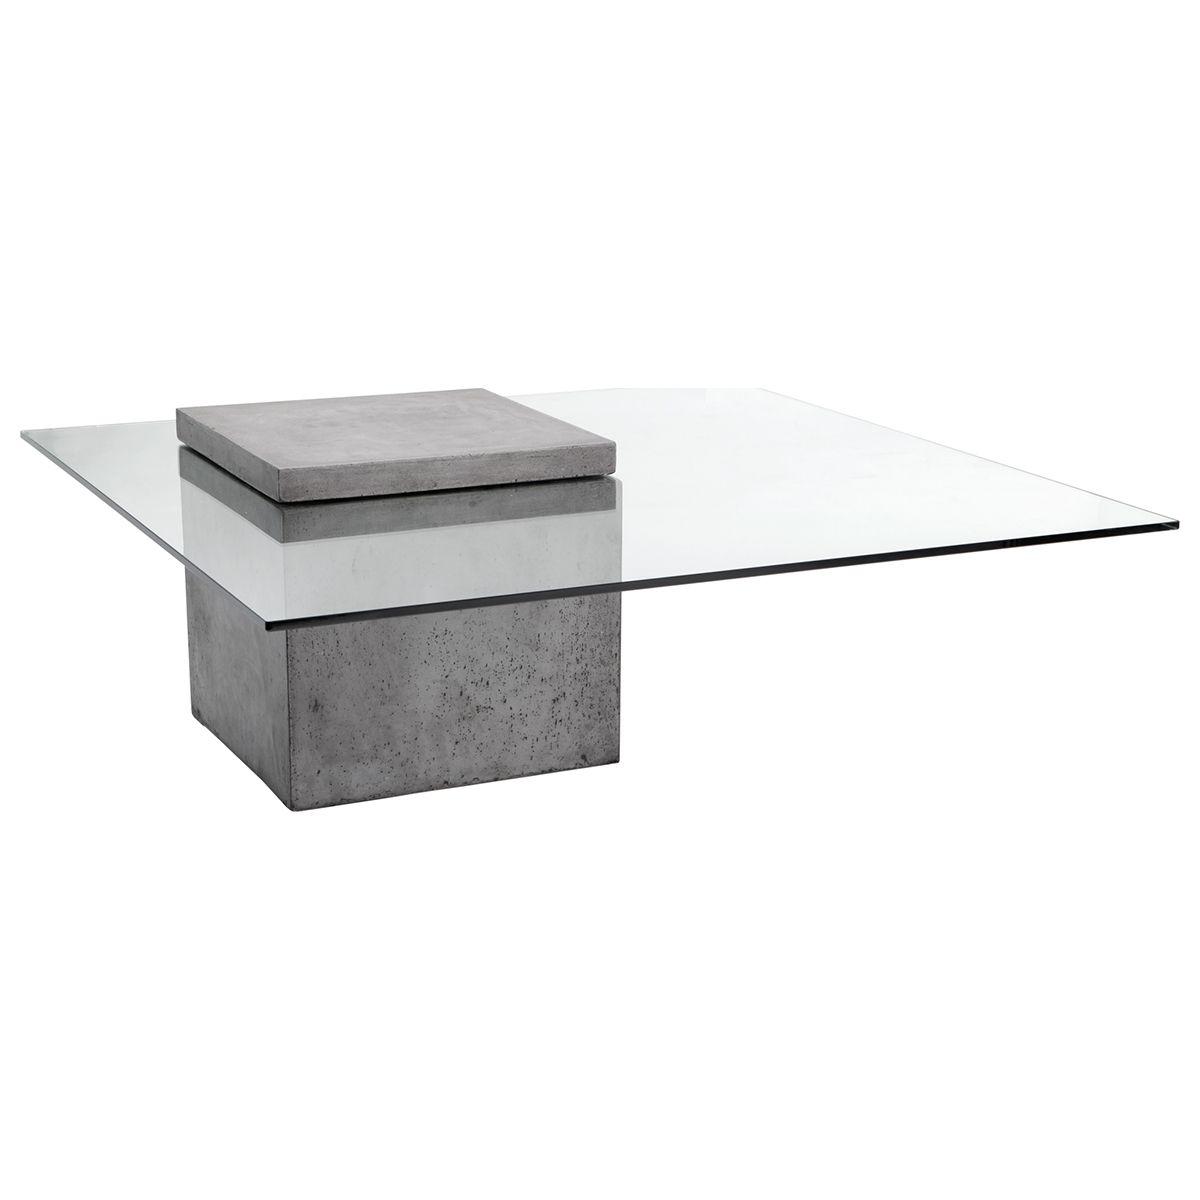 Grange Coffee Table Concrete Coffee Table Coffee Table Glass Coffee Table [ 1200 x 1200 Pixel ]